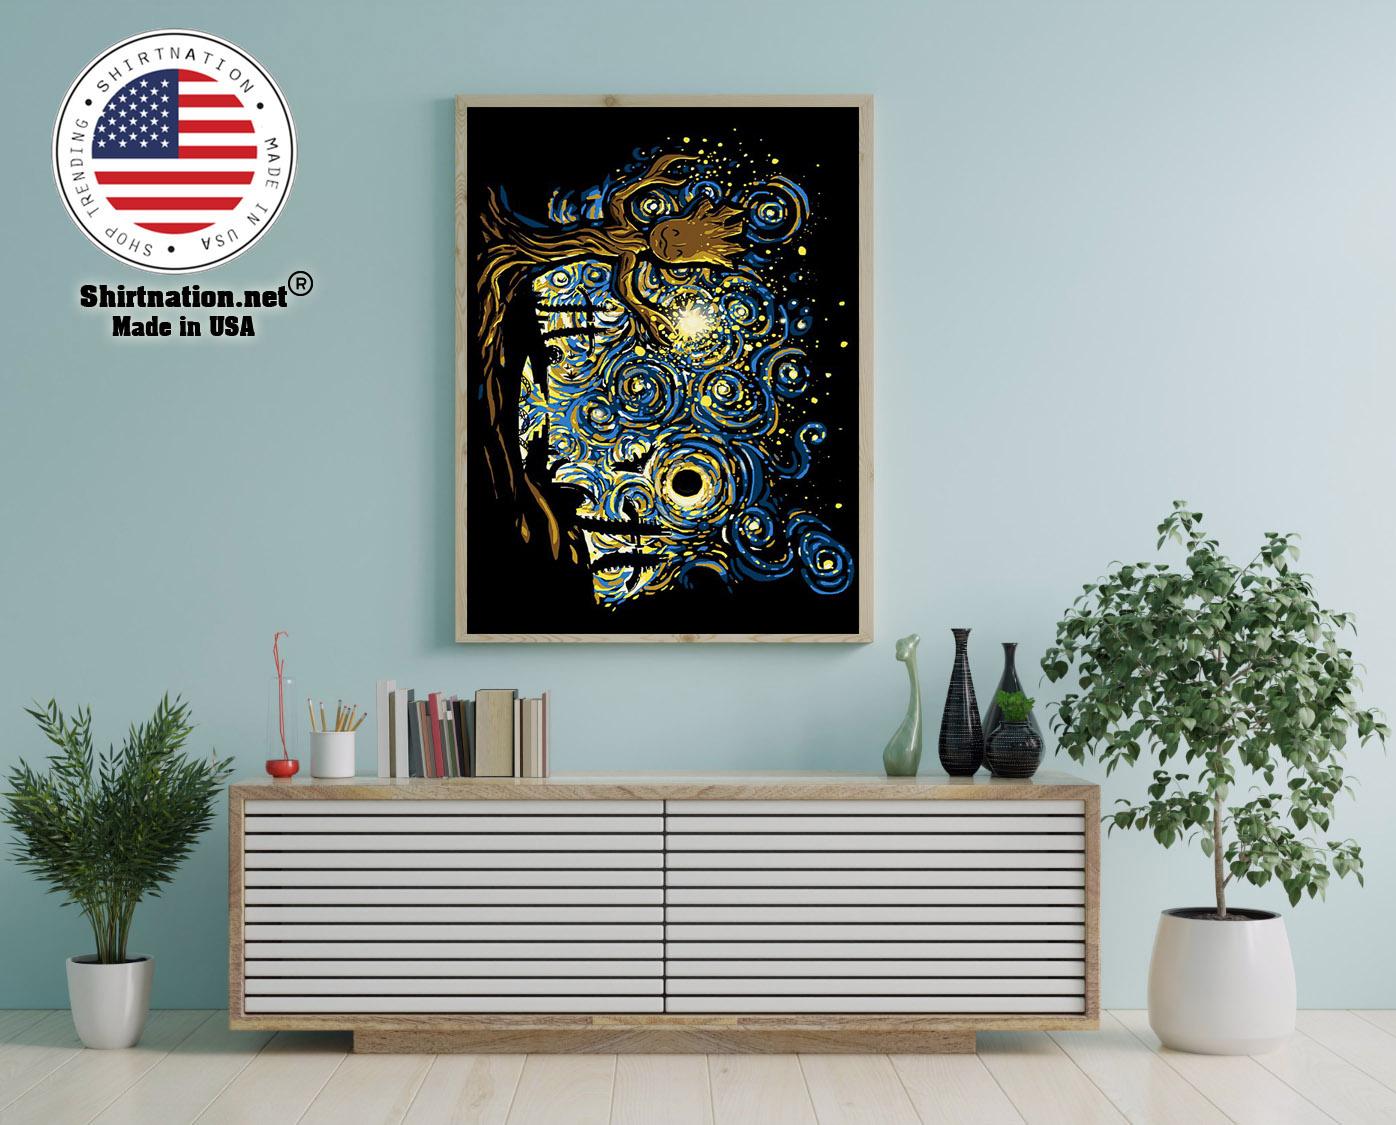 Vicent Van Gogh Groot poster 12